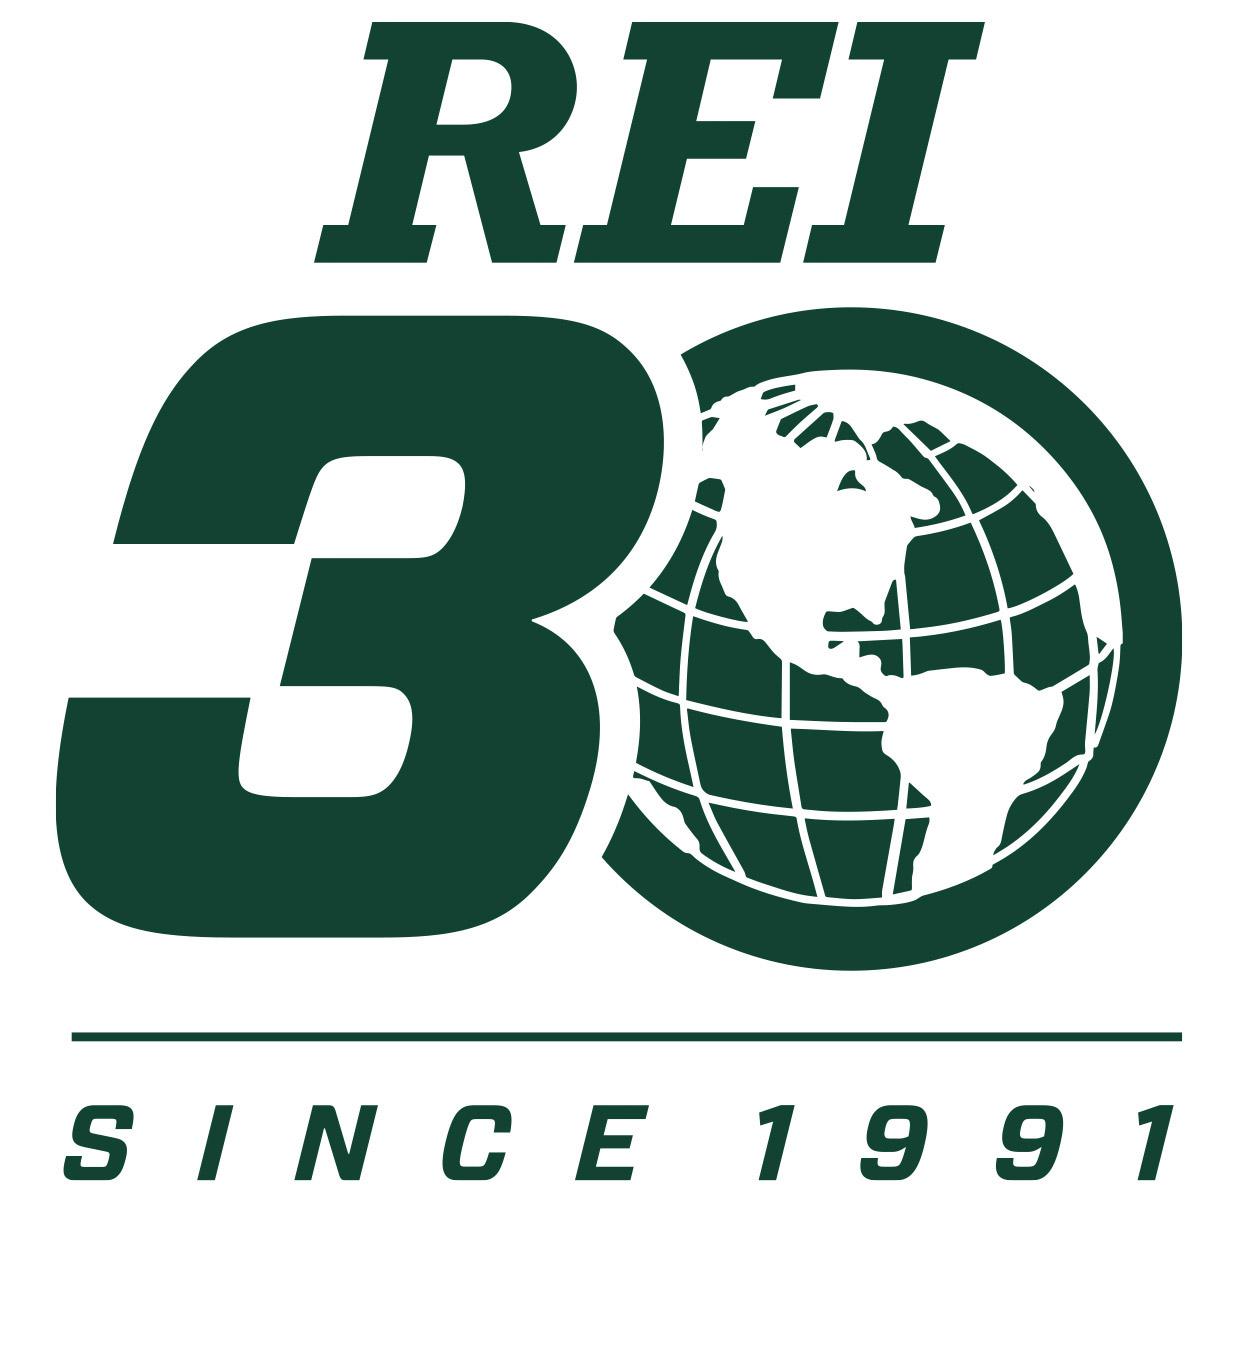 rei engineering 30 years